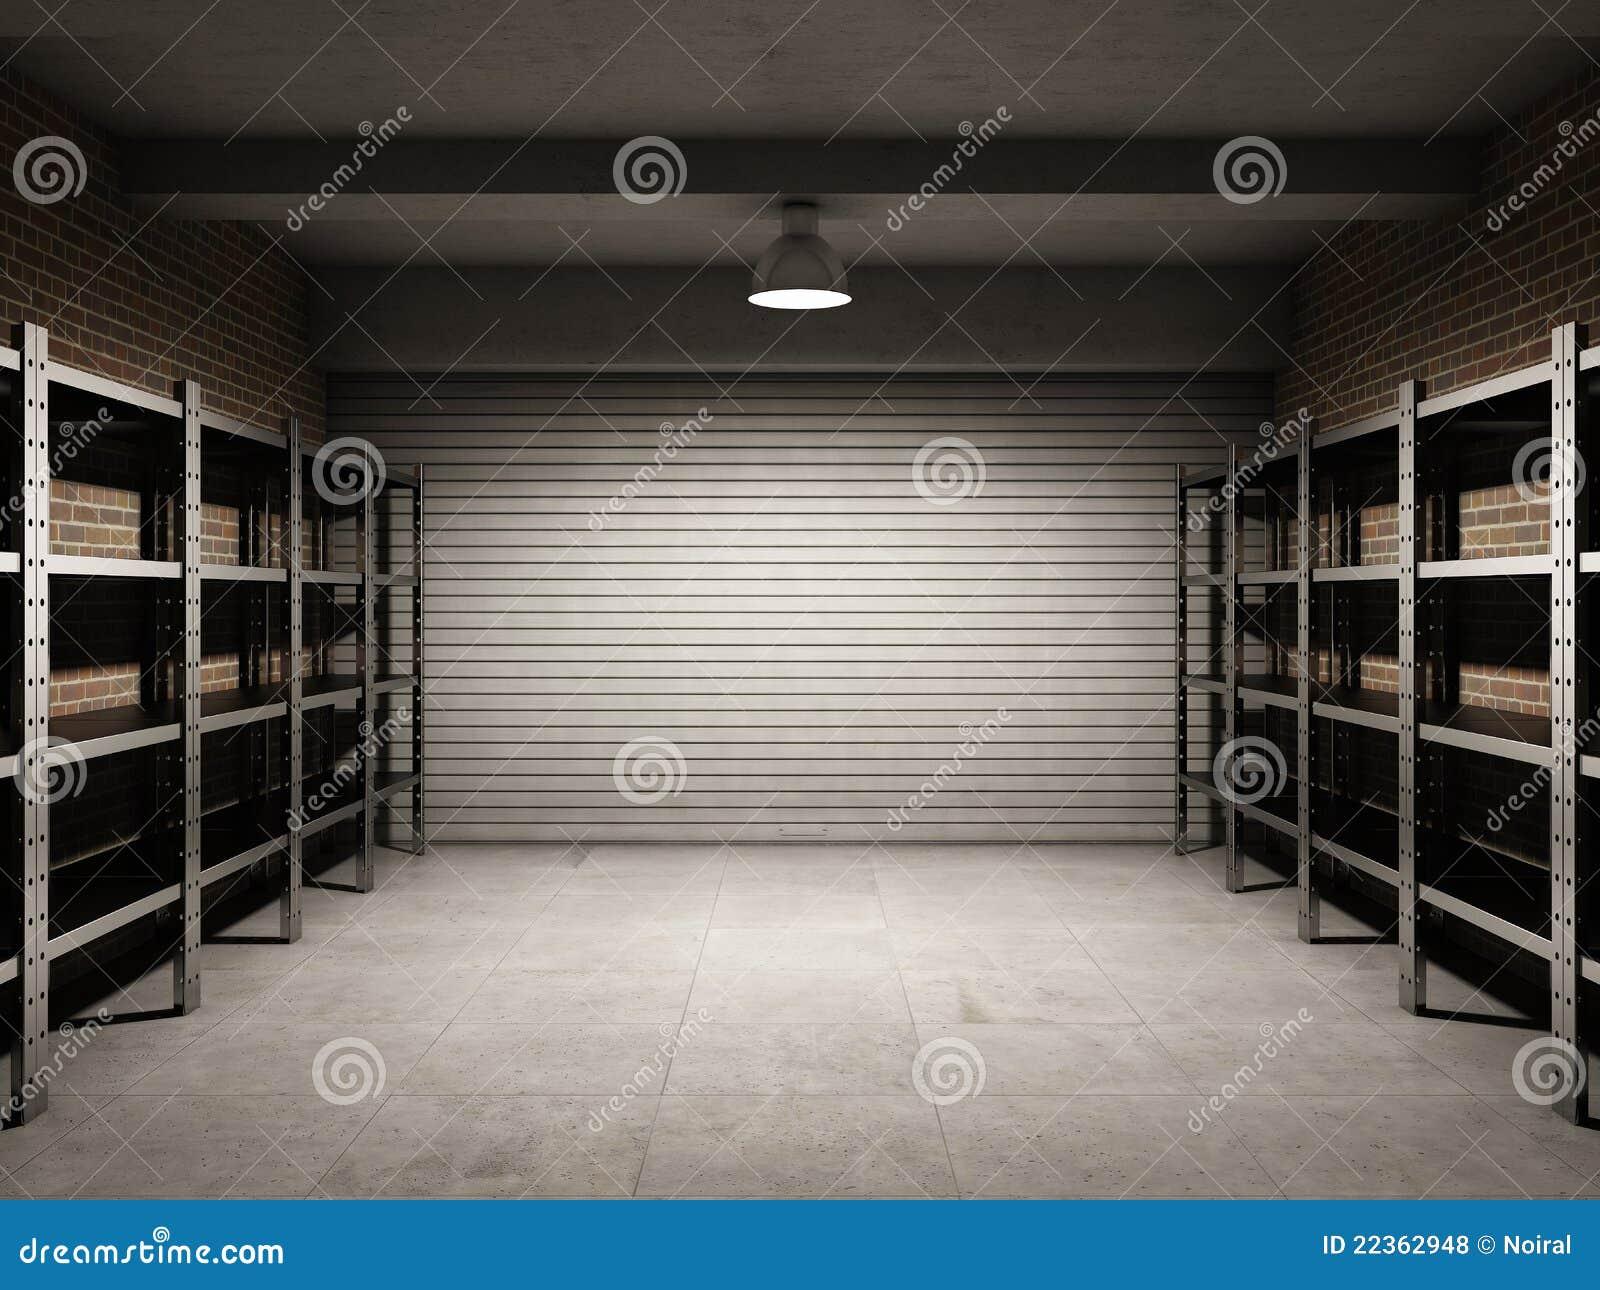 Empty Garage Royalty Free Stock Photos - Image: 22362948